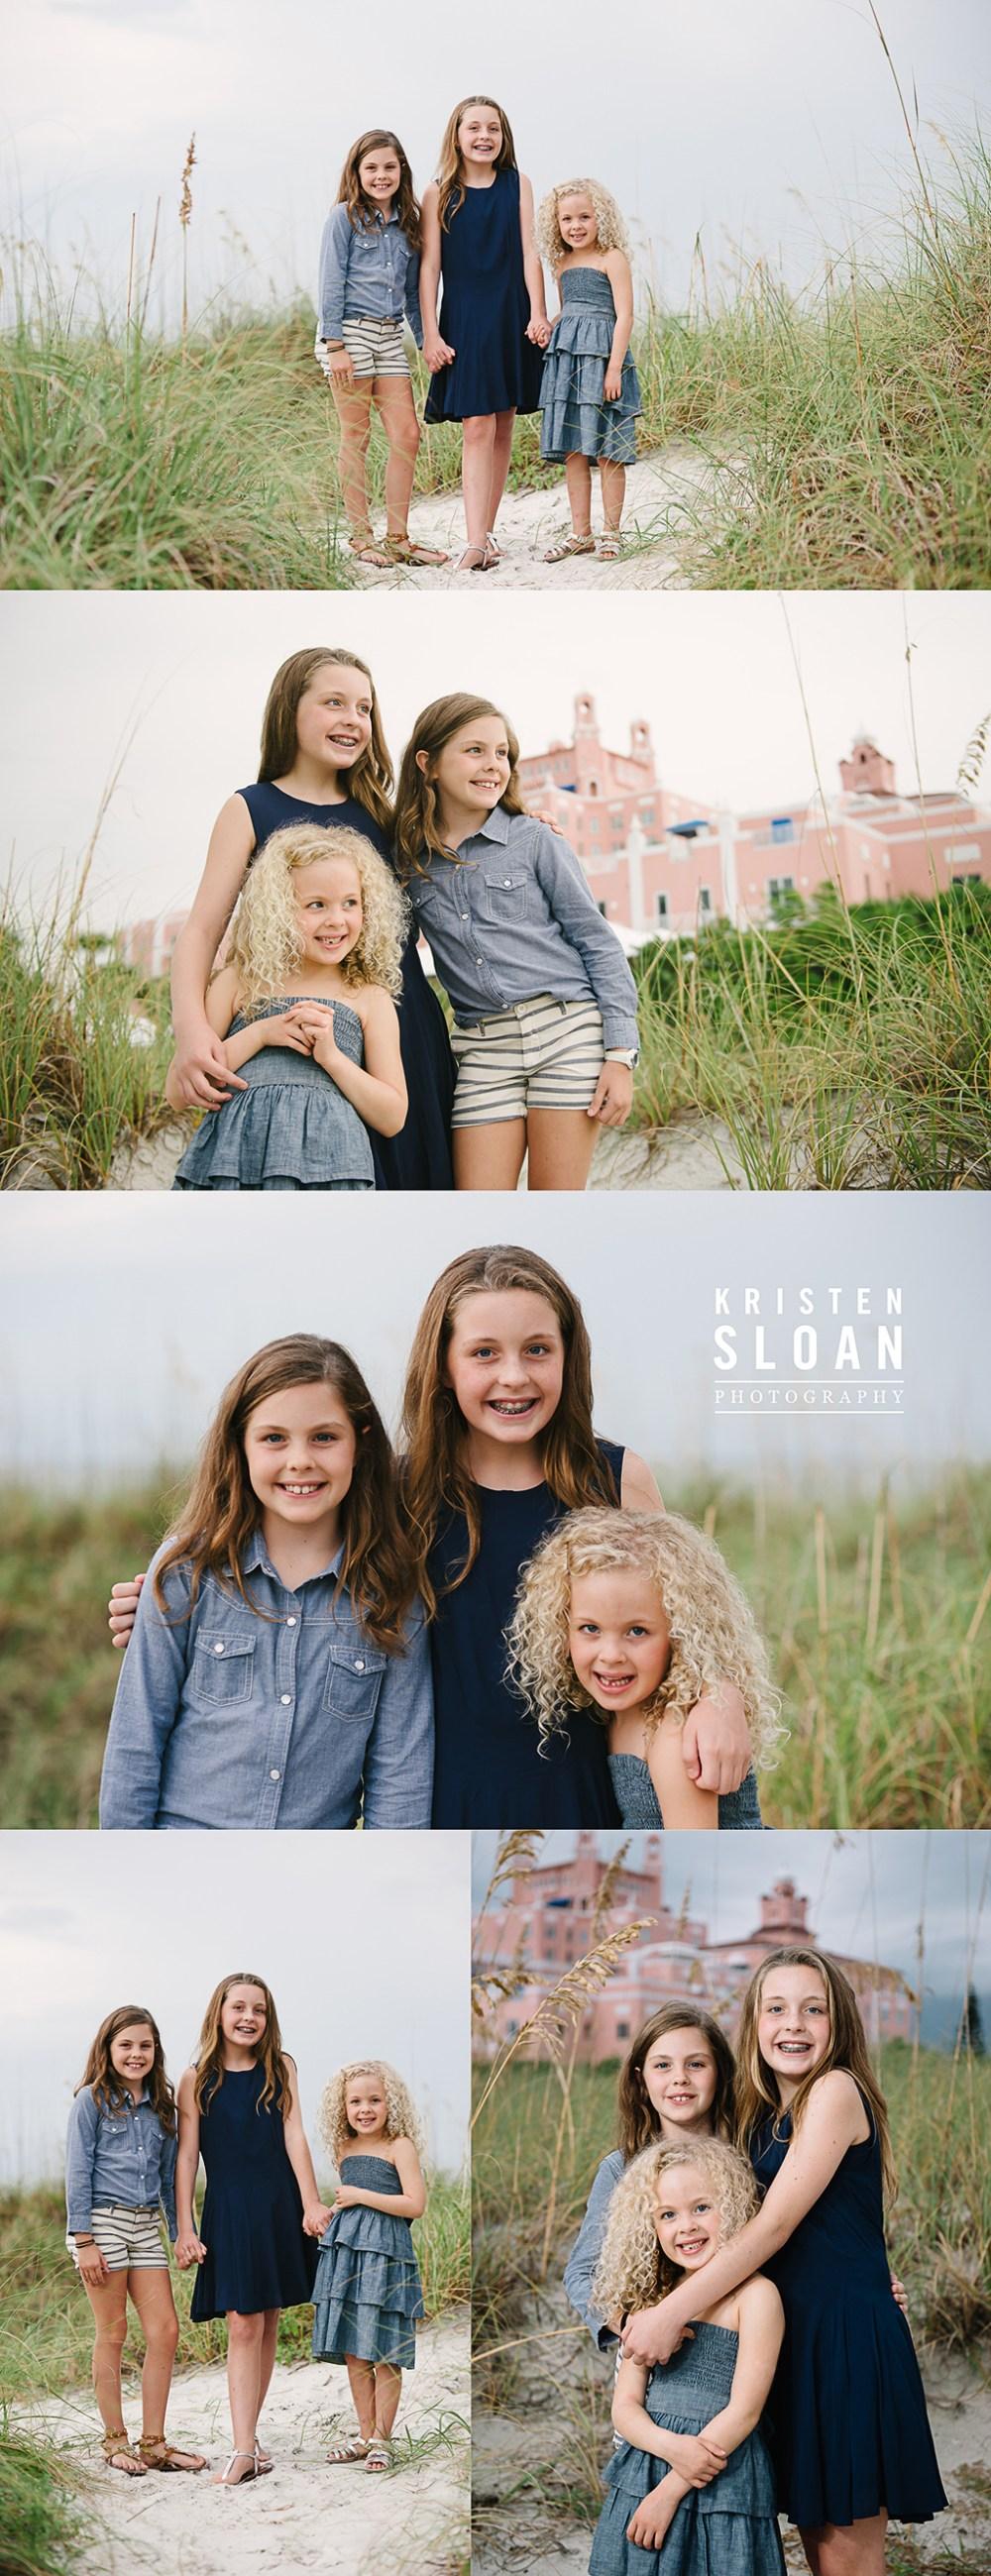 Loews Don Cesar Hotel Family Kids Couples Beach Portrait Photos by Kristen Sloan Photography | St Pete Beach FL Photographer | Pass A Grille Beach FL Photographer